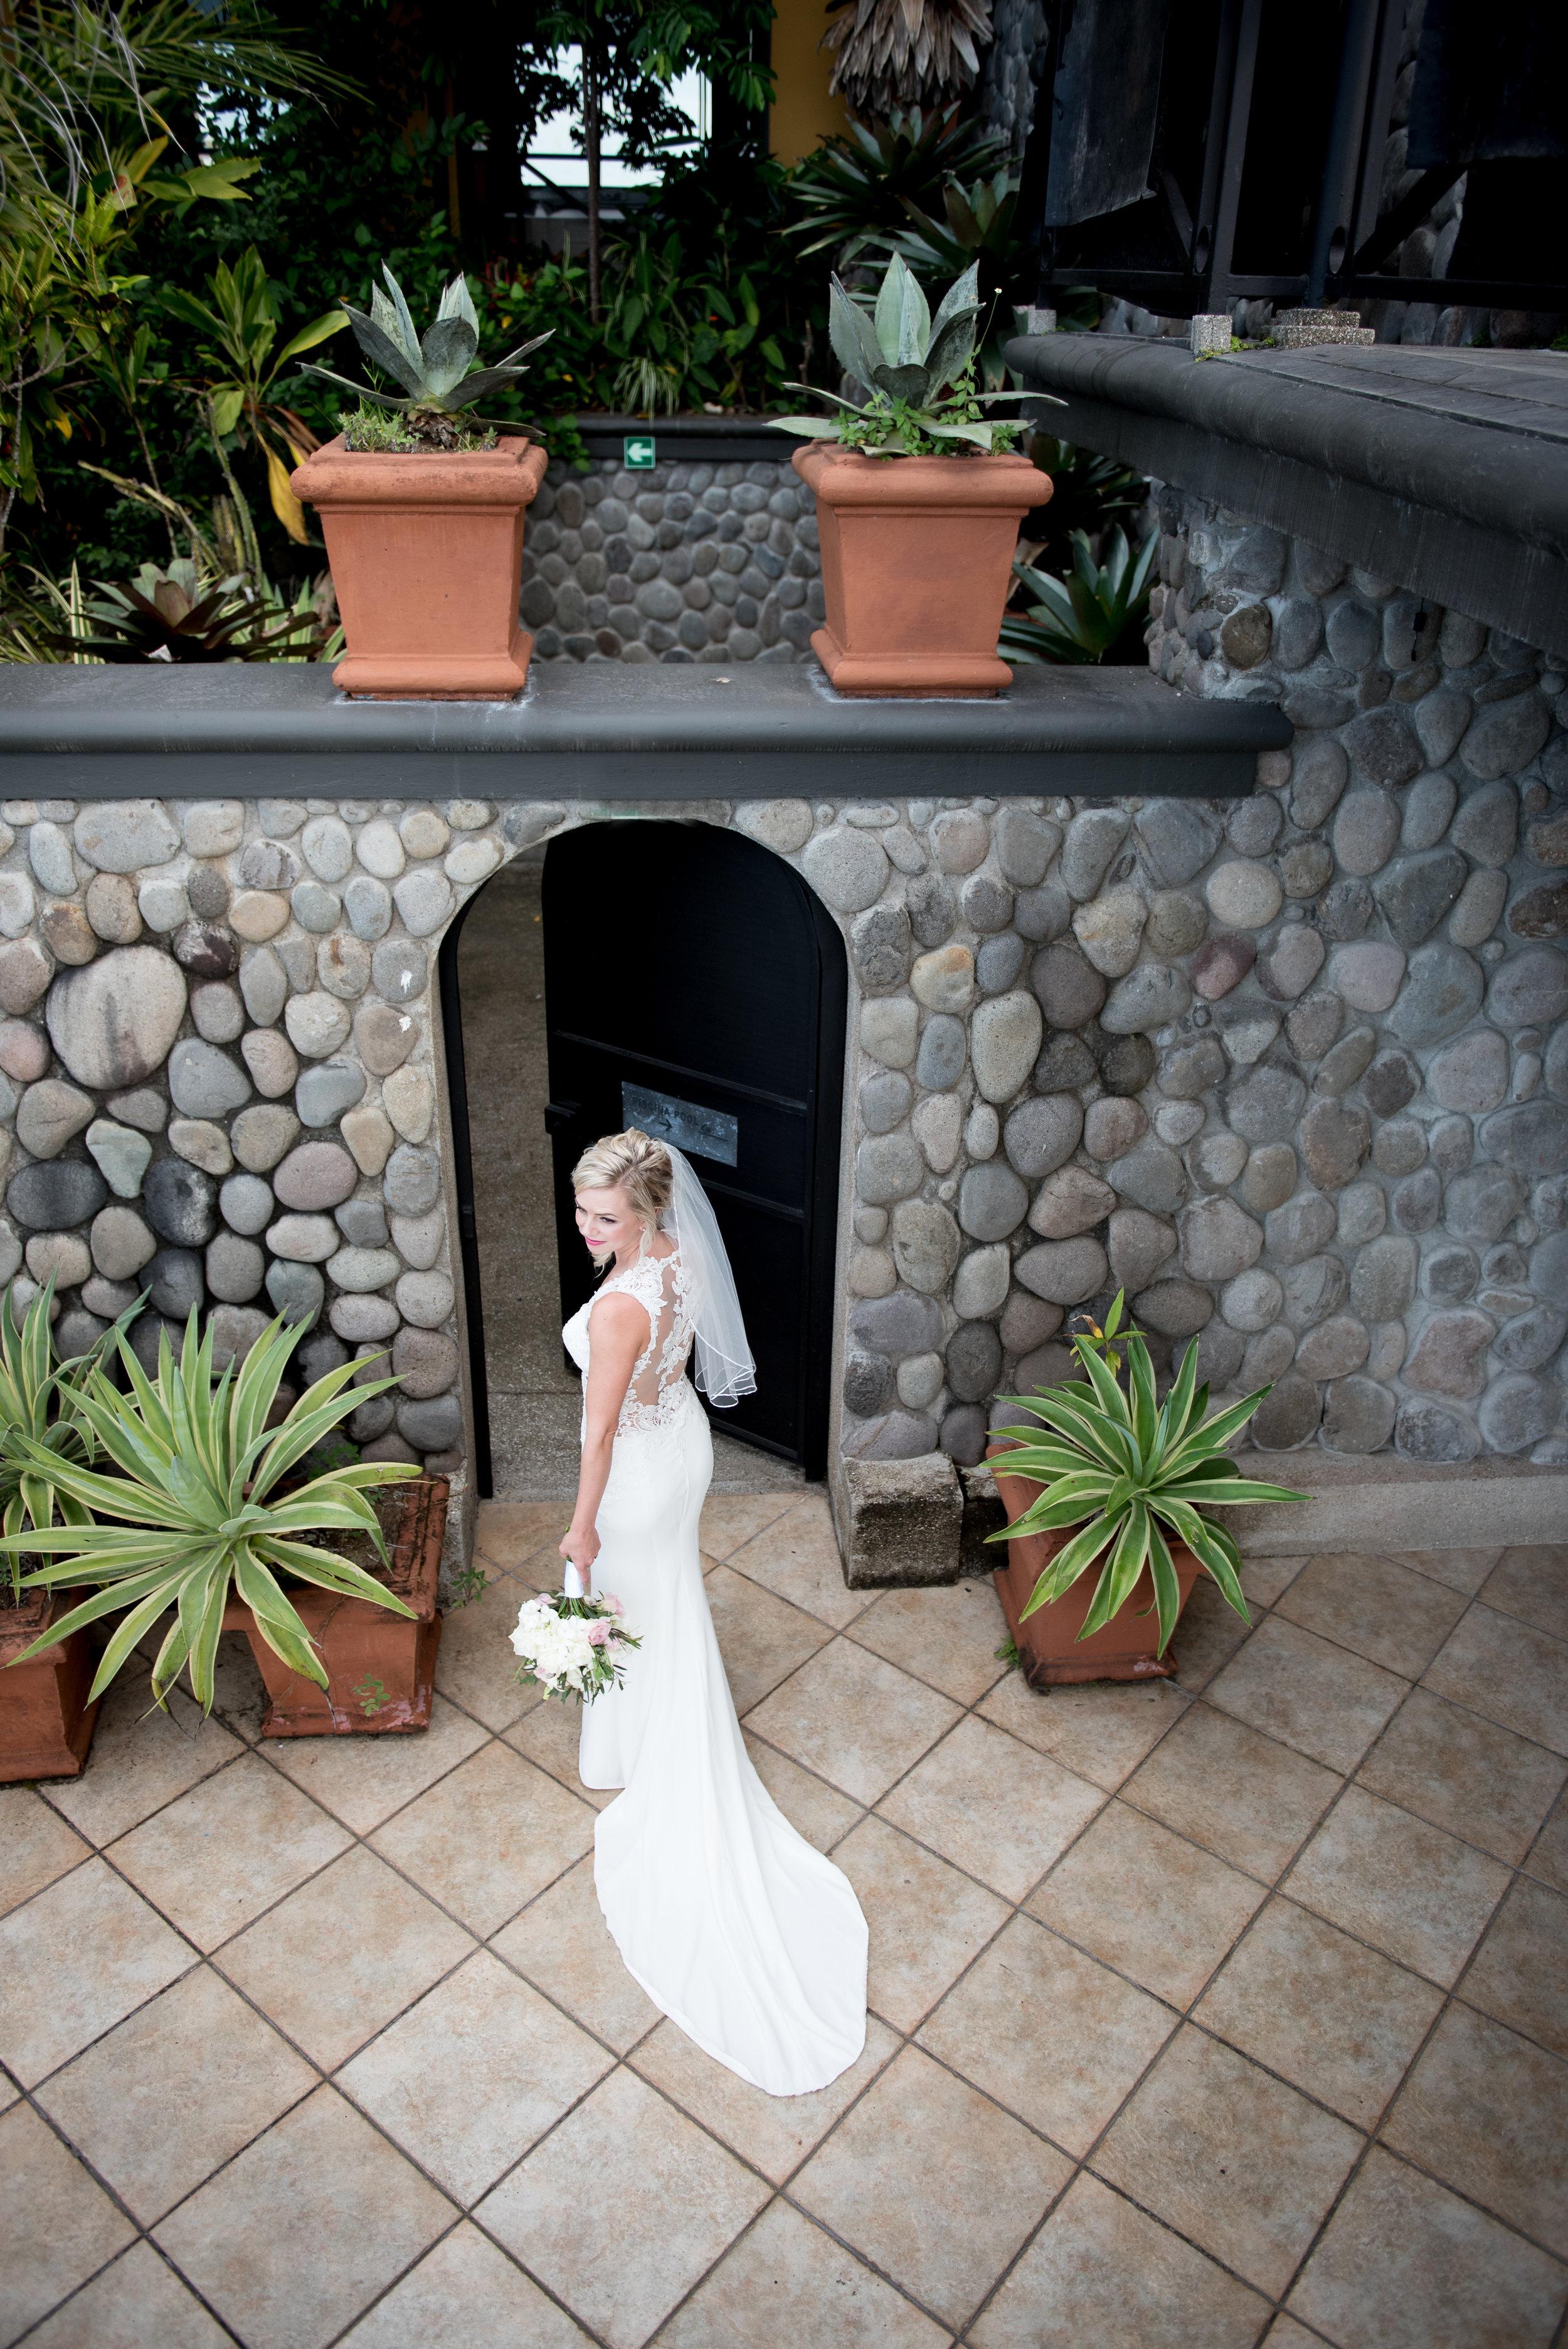 Lindsay & Michael,   Costa Rica    Z  ephyr Palace